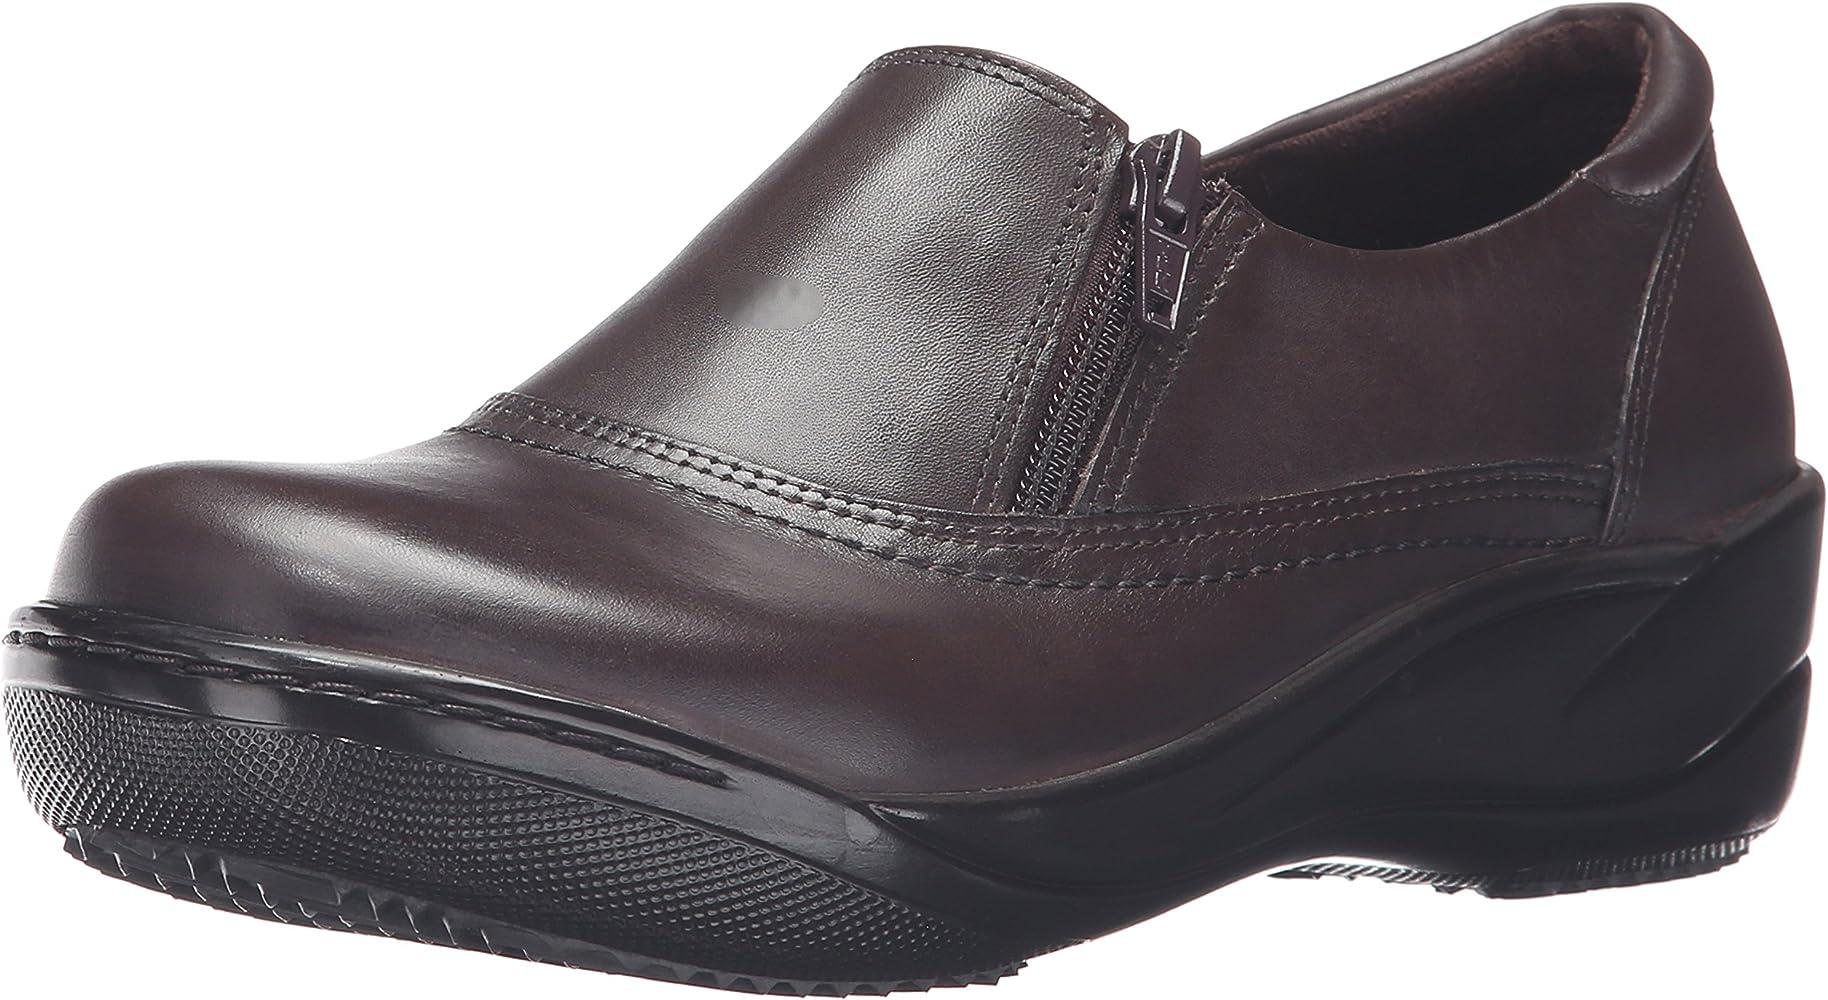 Amazon.com: CHEROKEE Women's Maggie Health Care & Food Service Shoe, Brown,  11 M US: Shoes